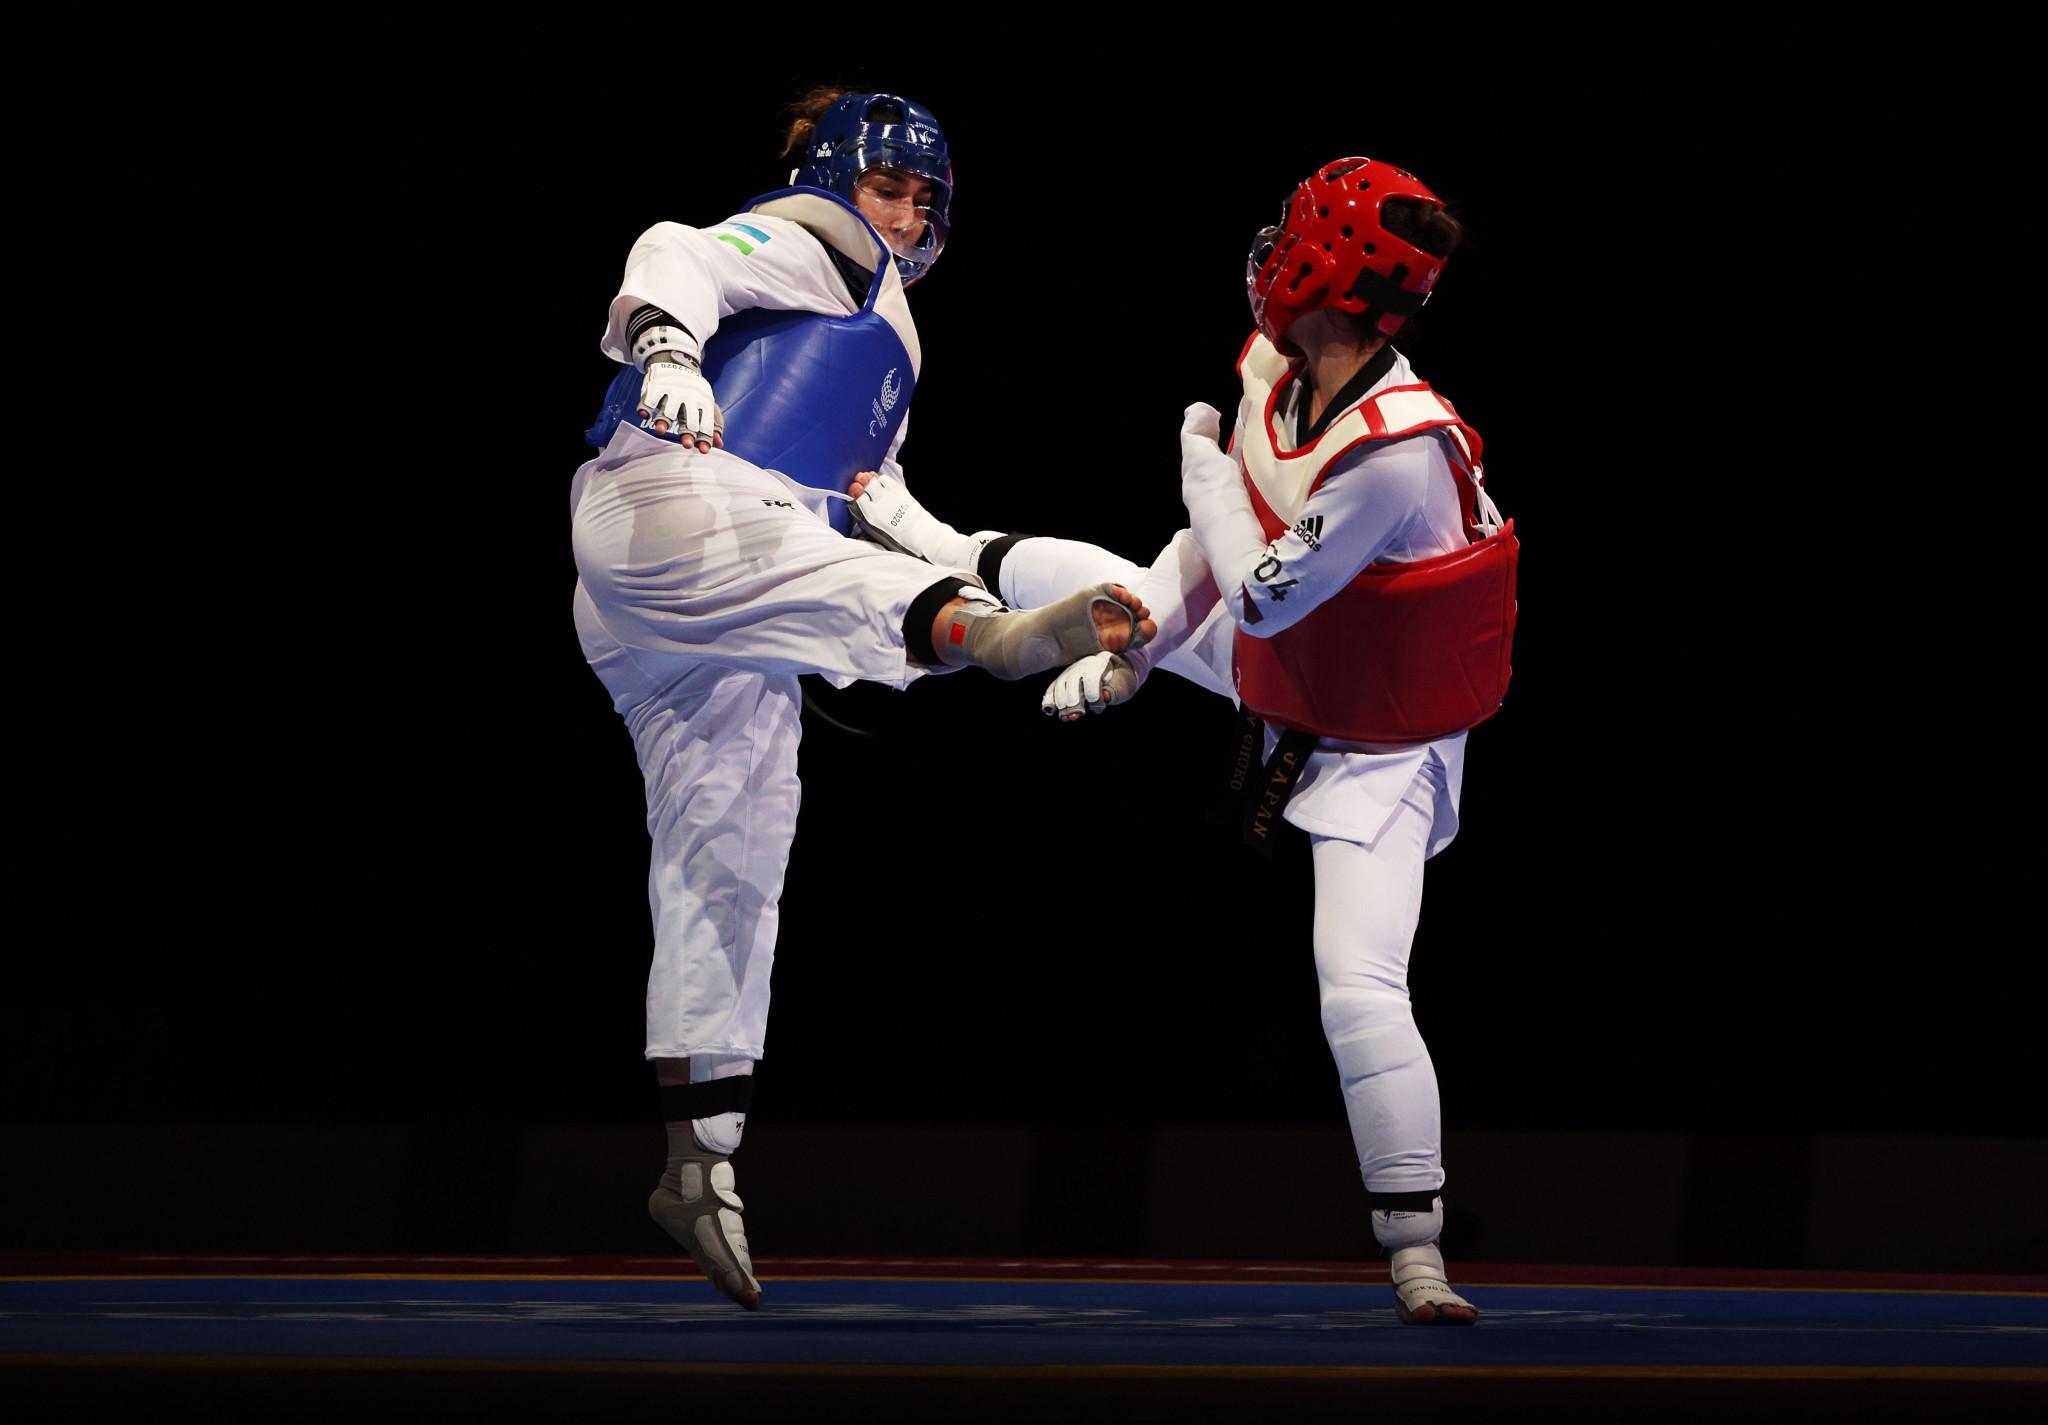 Aziziaghdam claims comeback win as Naimova underlines talent with taekwondo gold